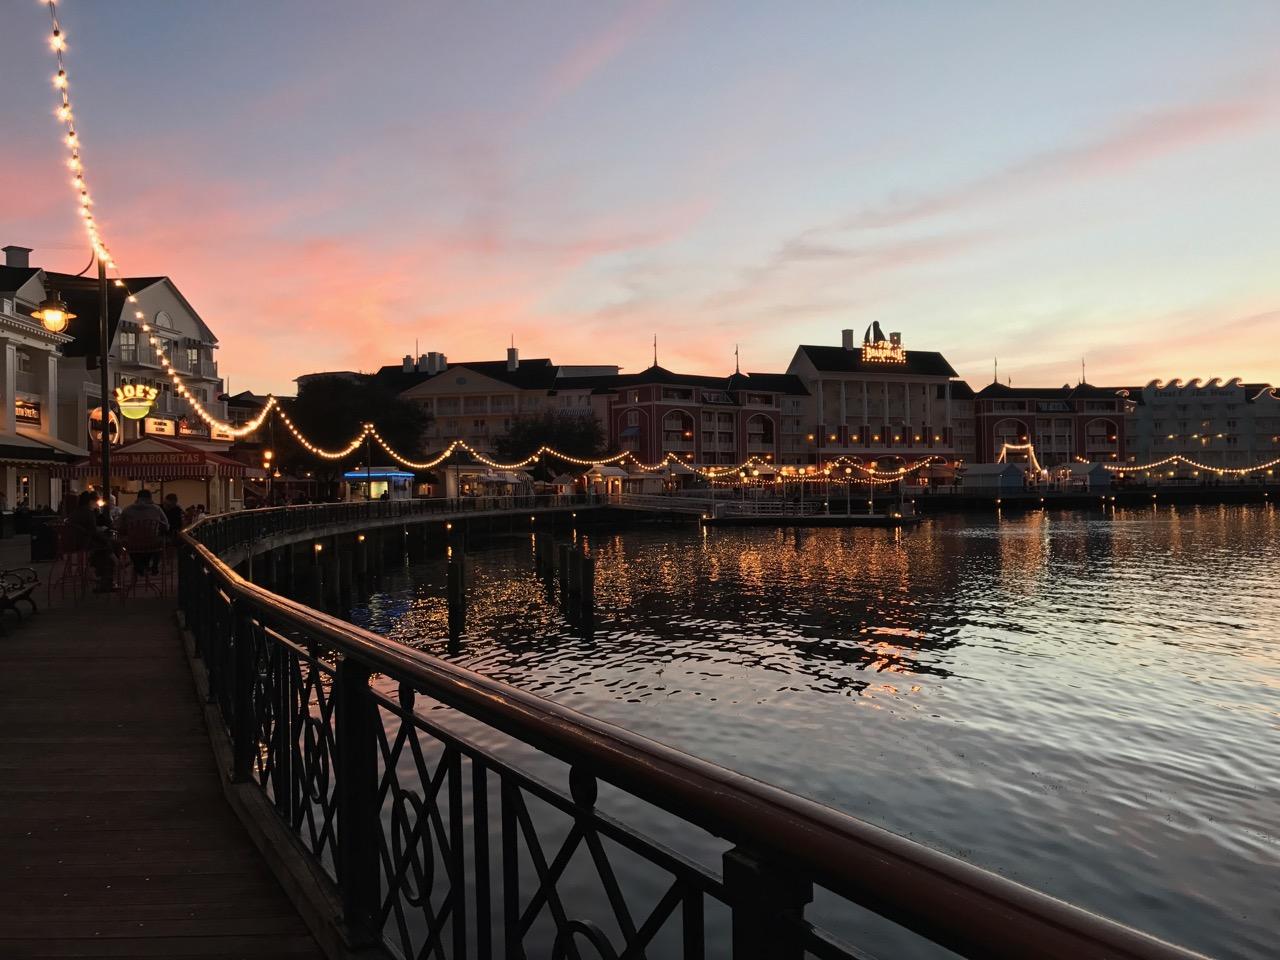 disney world best deluxe resort hotel ranking 00 boardwalk night.jpeg